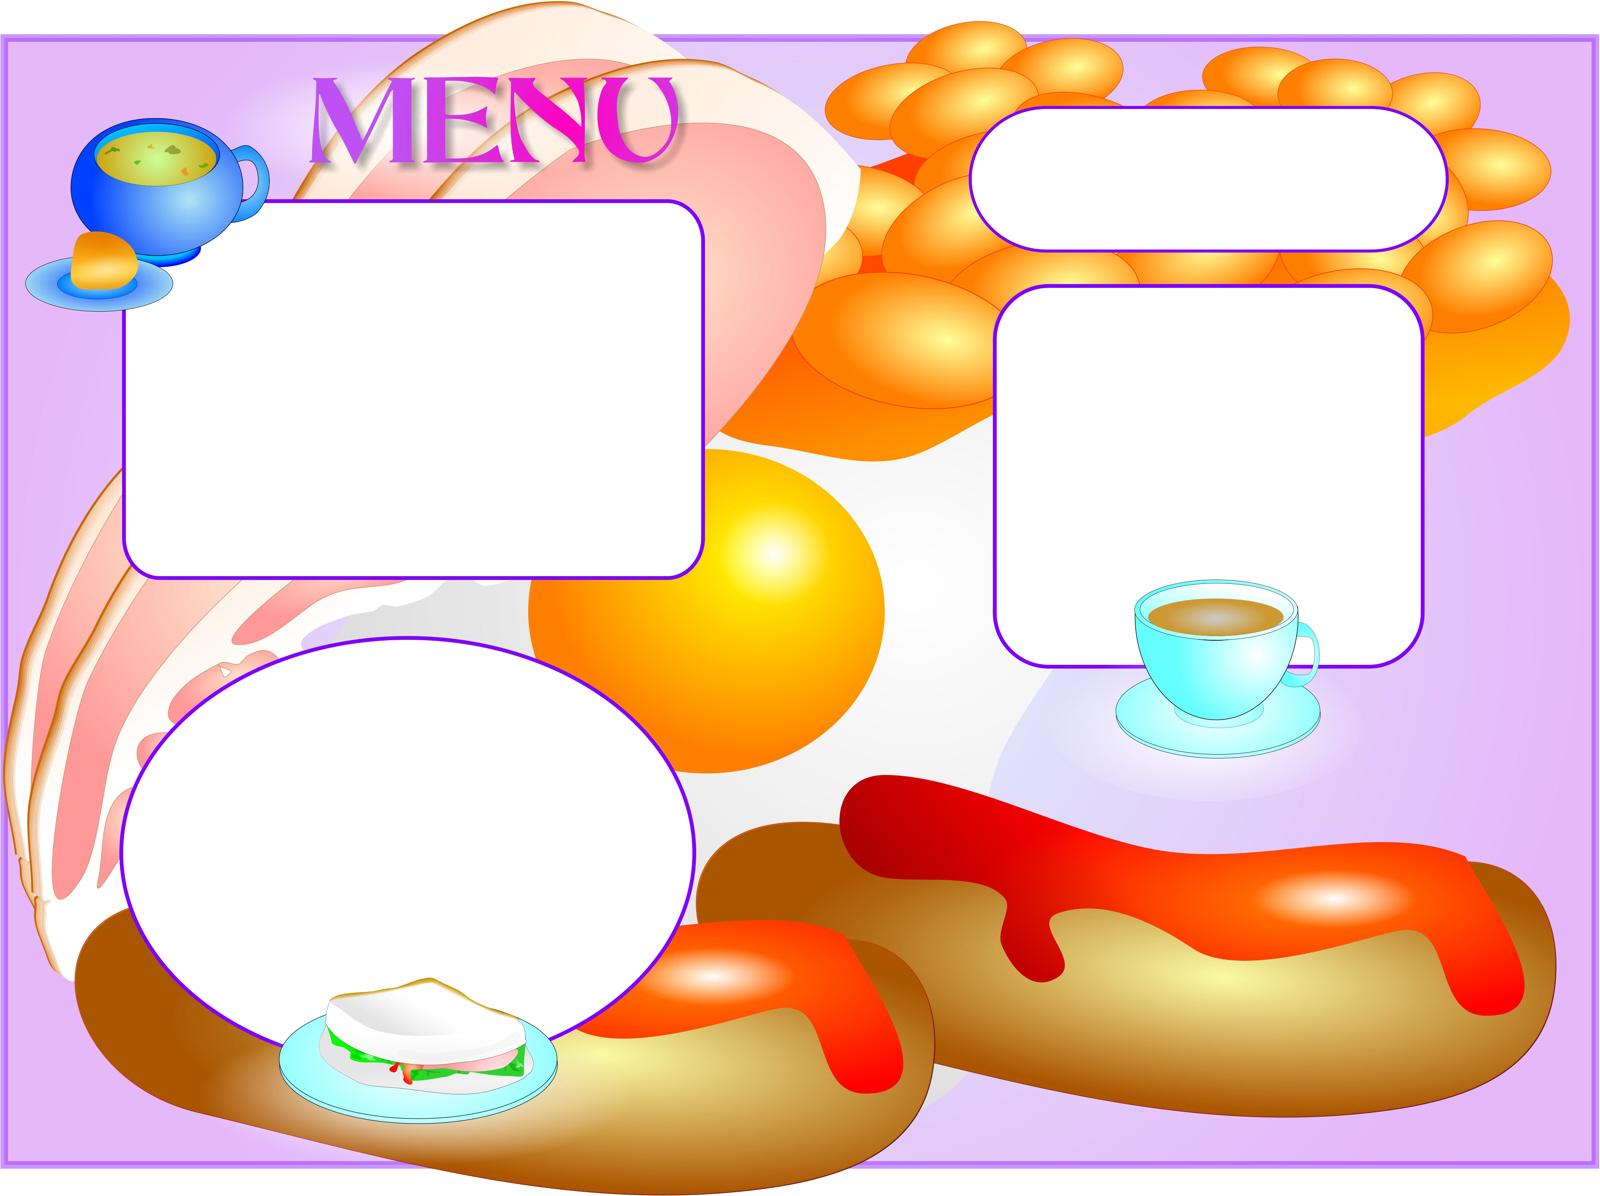 Menu Template, Bacon, Beans, Border, Cafe, HQ Photo